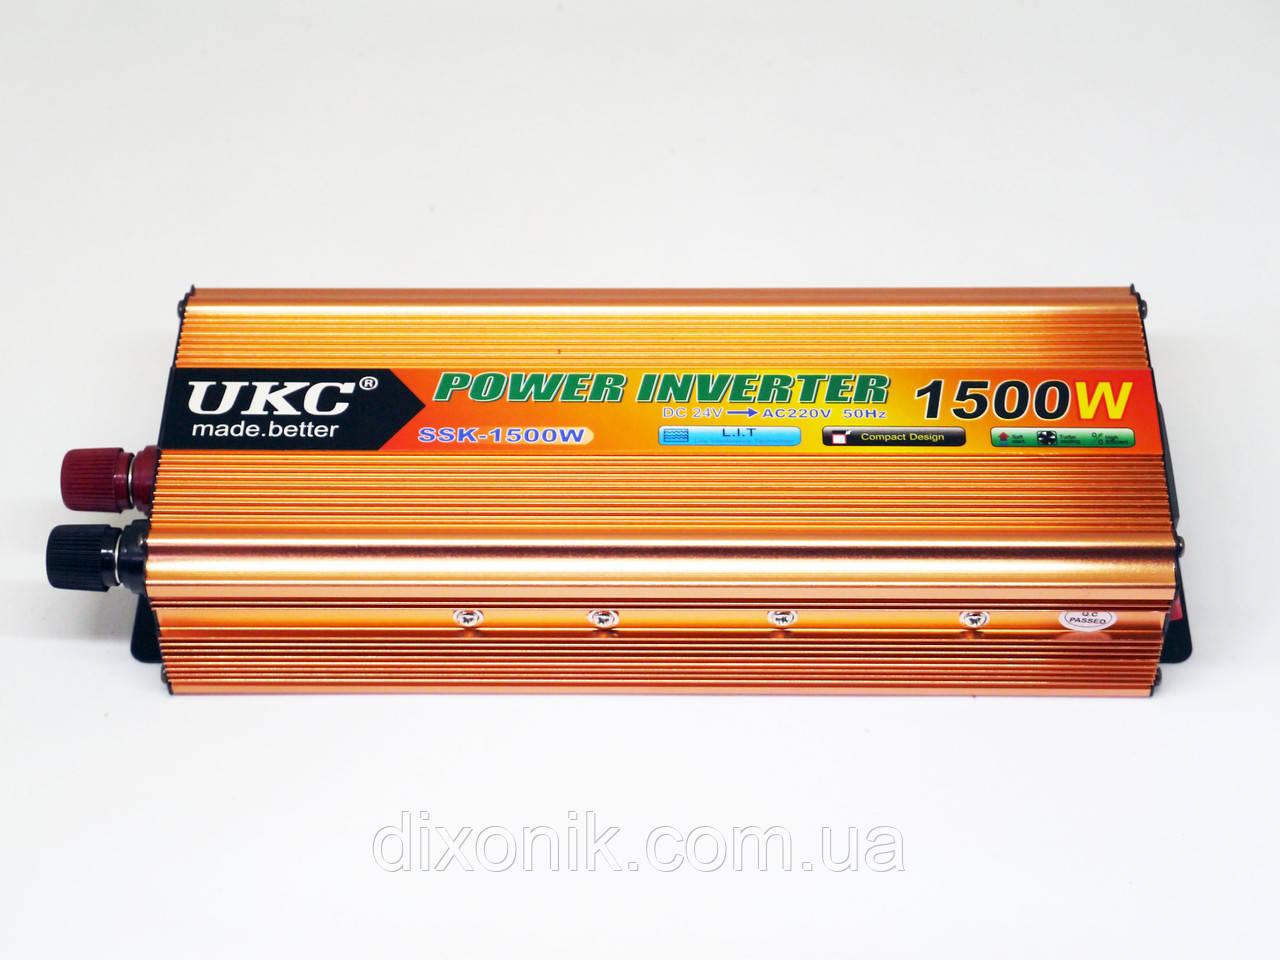 Инвертор UKC 1500W 24V Преобразователь тока AC/DC Gold 24V в 220V